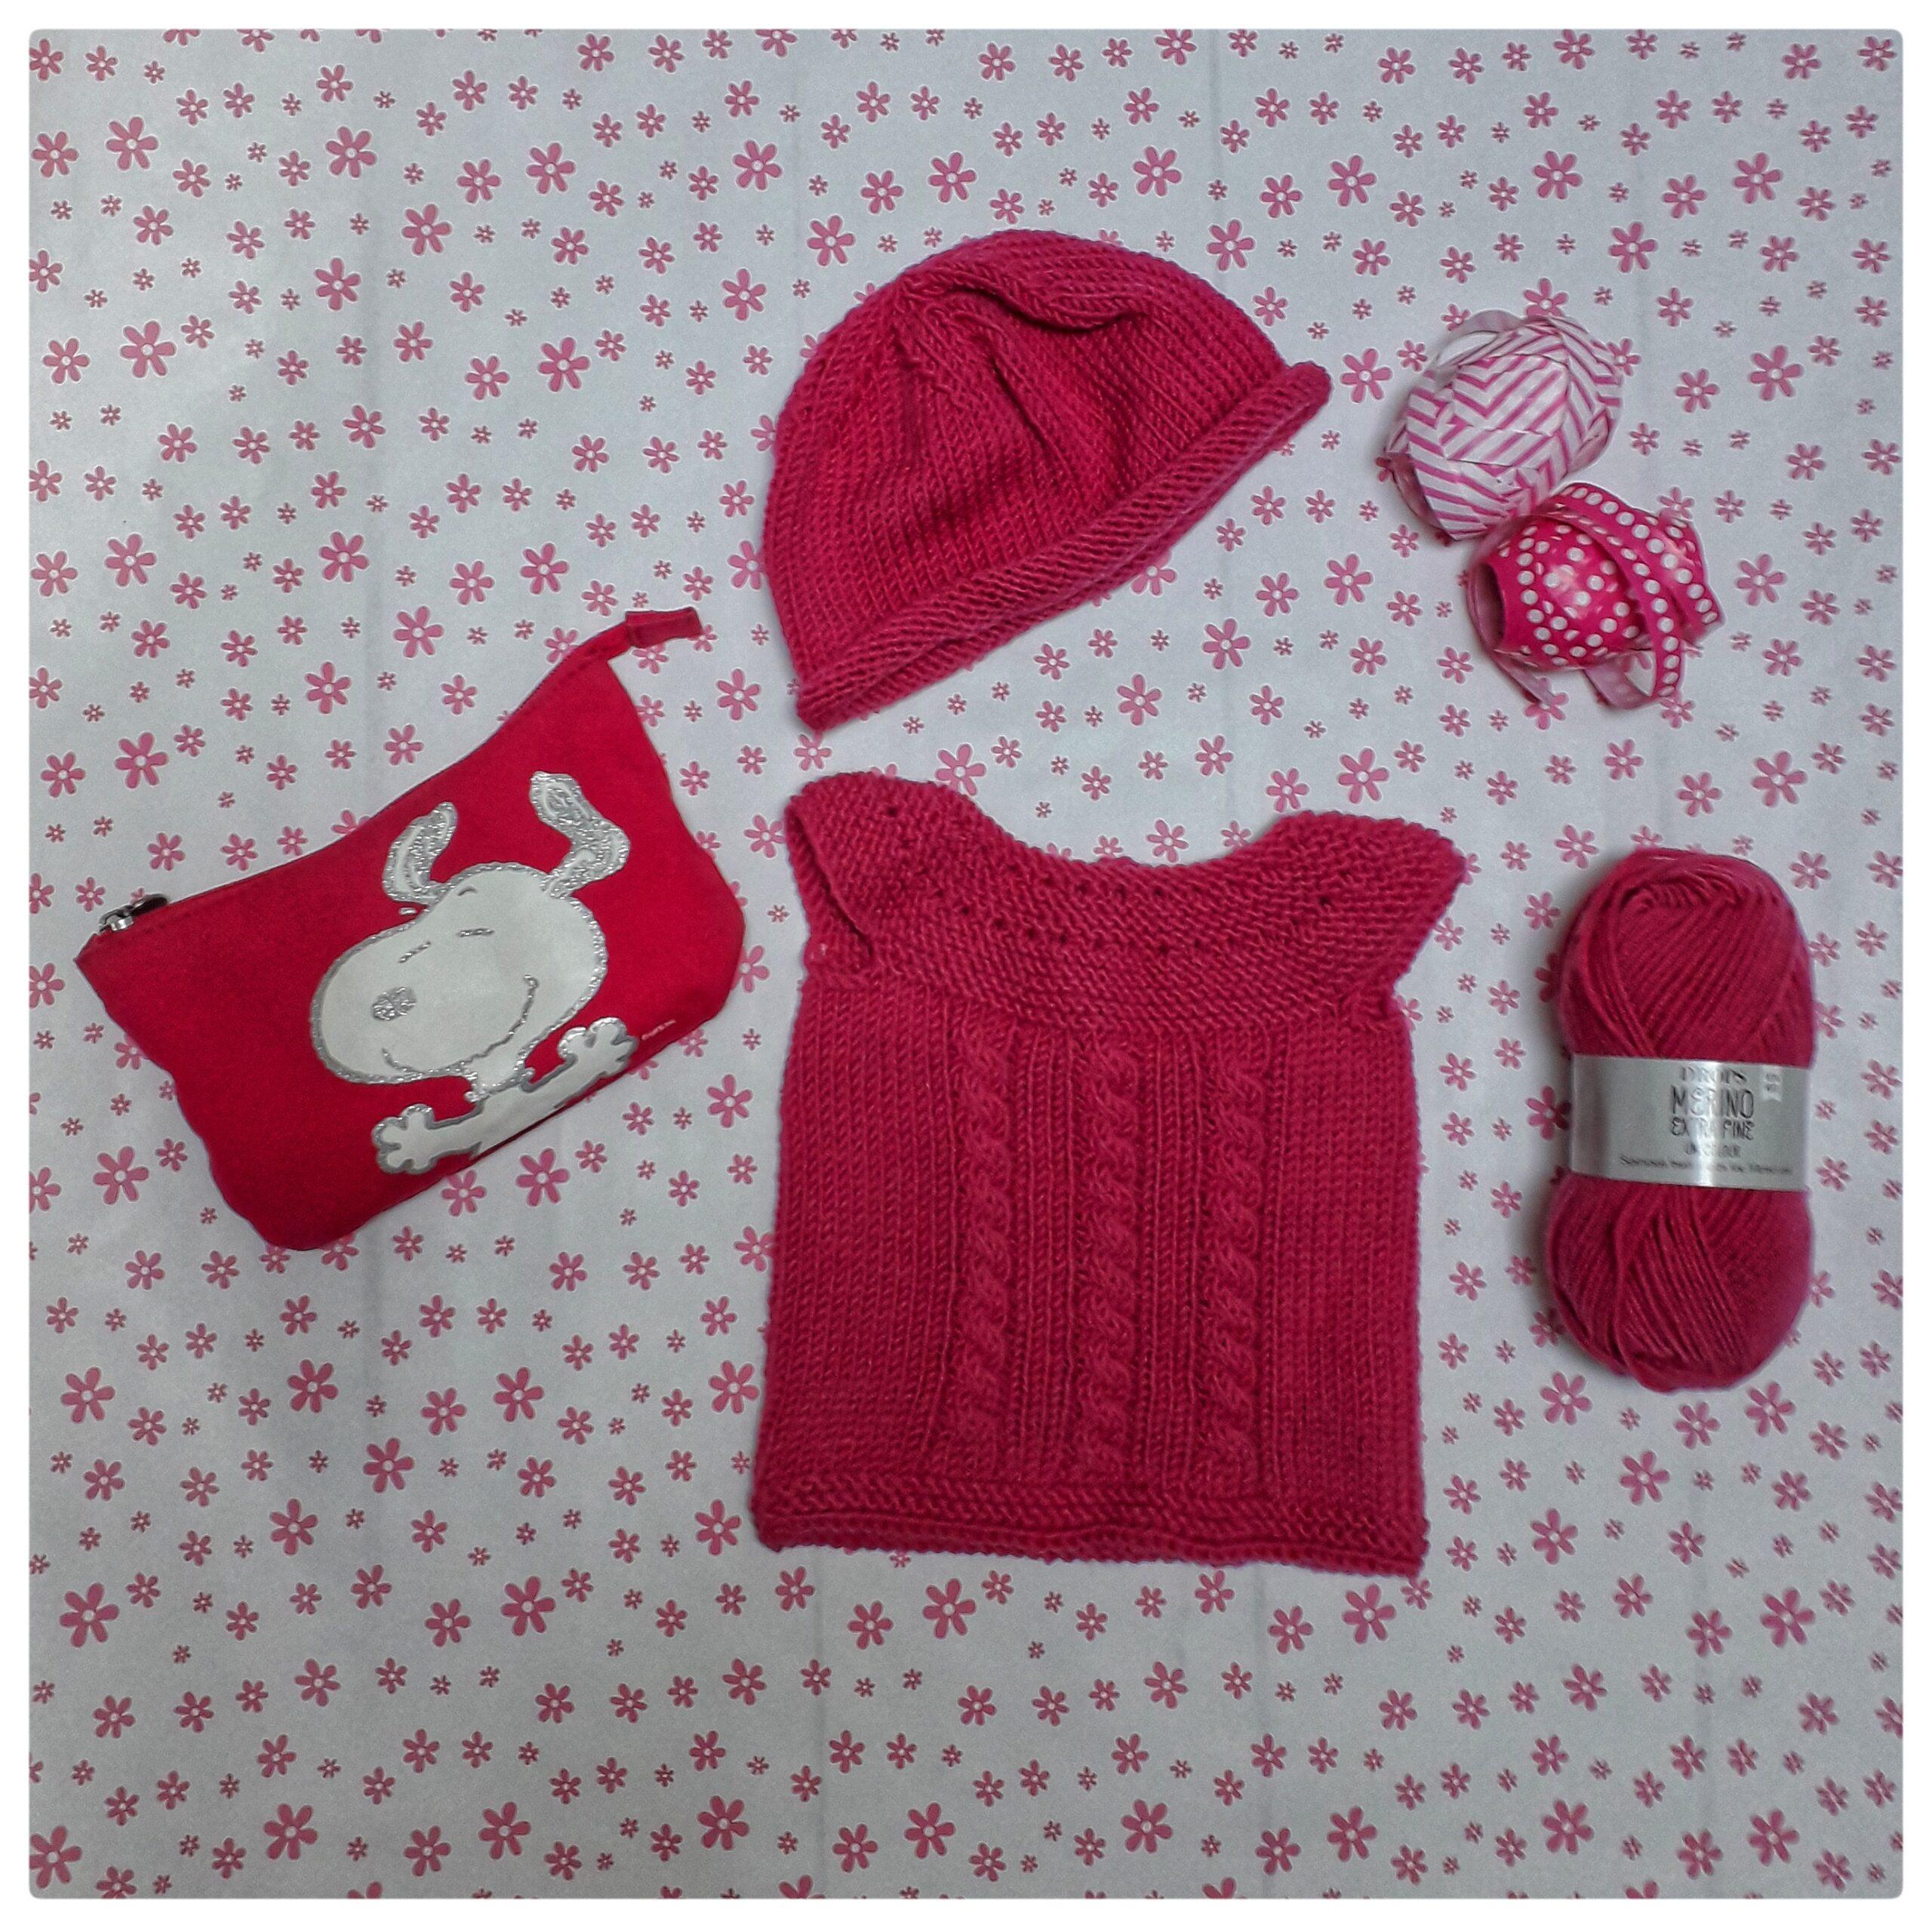 vest 0-12 month knitting pattern